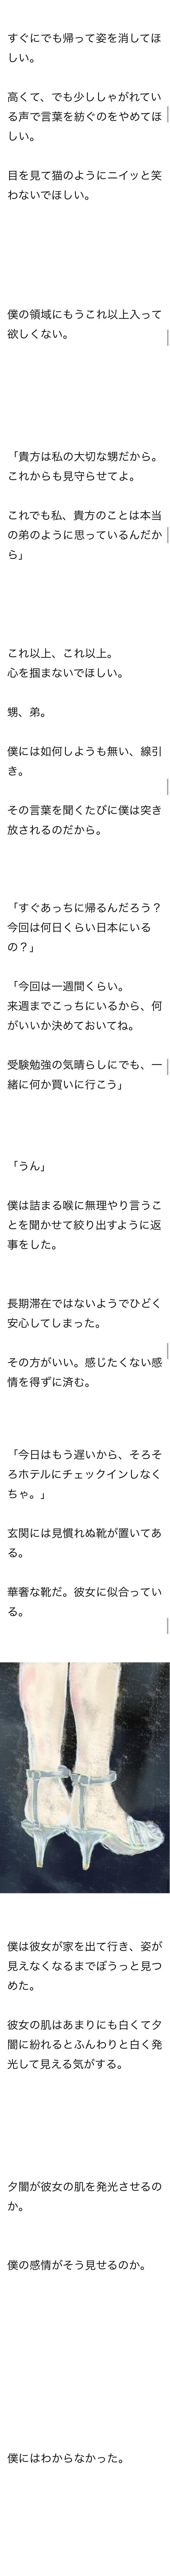 nappa_2.jpg